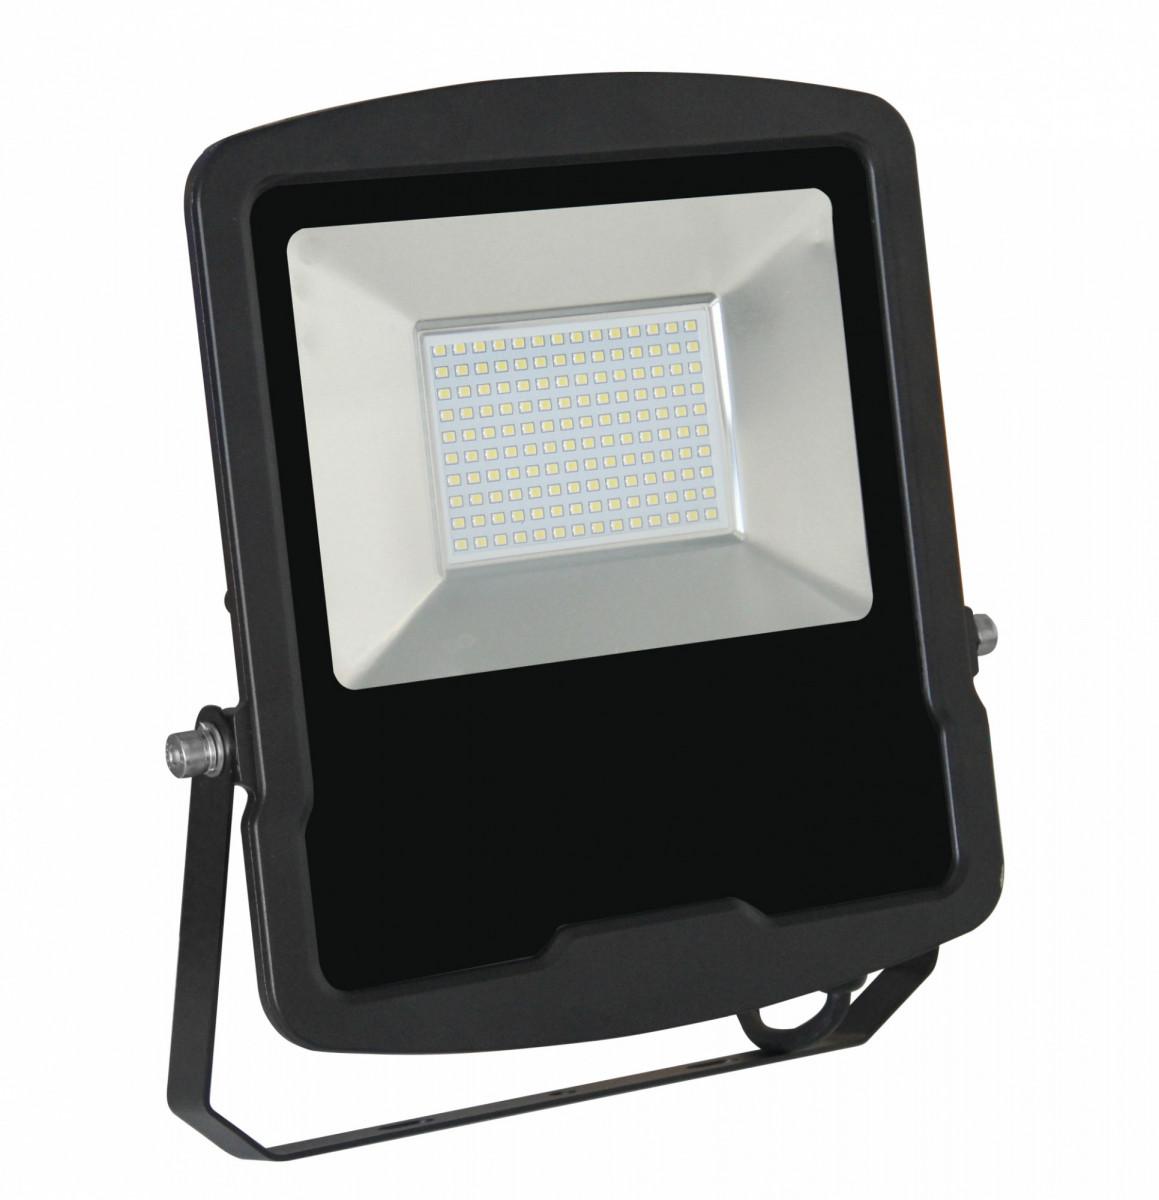 Прожектор ЭРА LPR-200-6500K SMD Eco Slim 200Вт 18000Лм 6500K 305х205